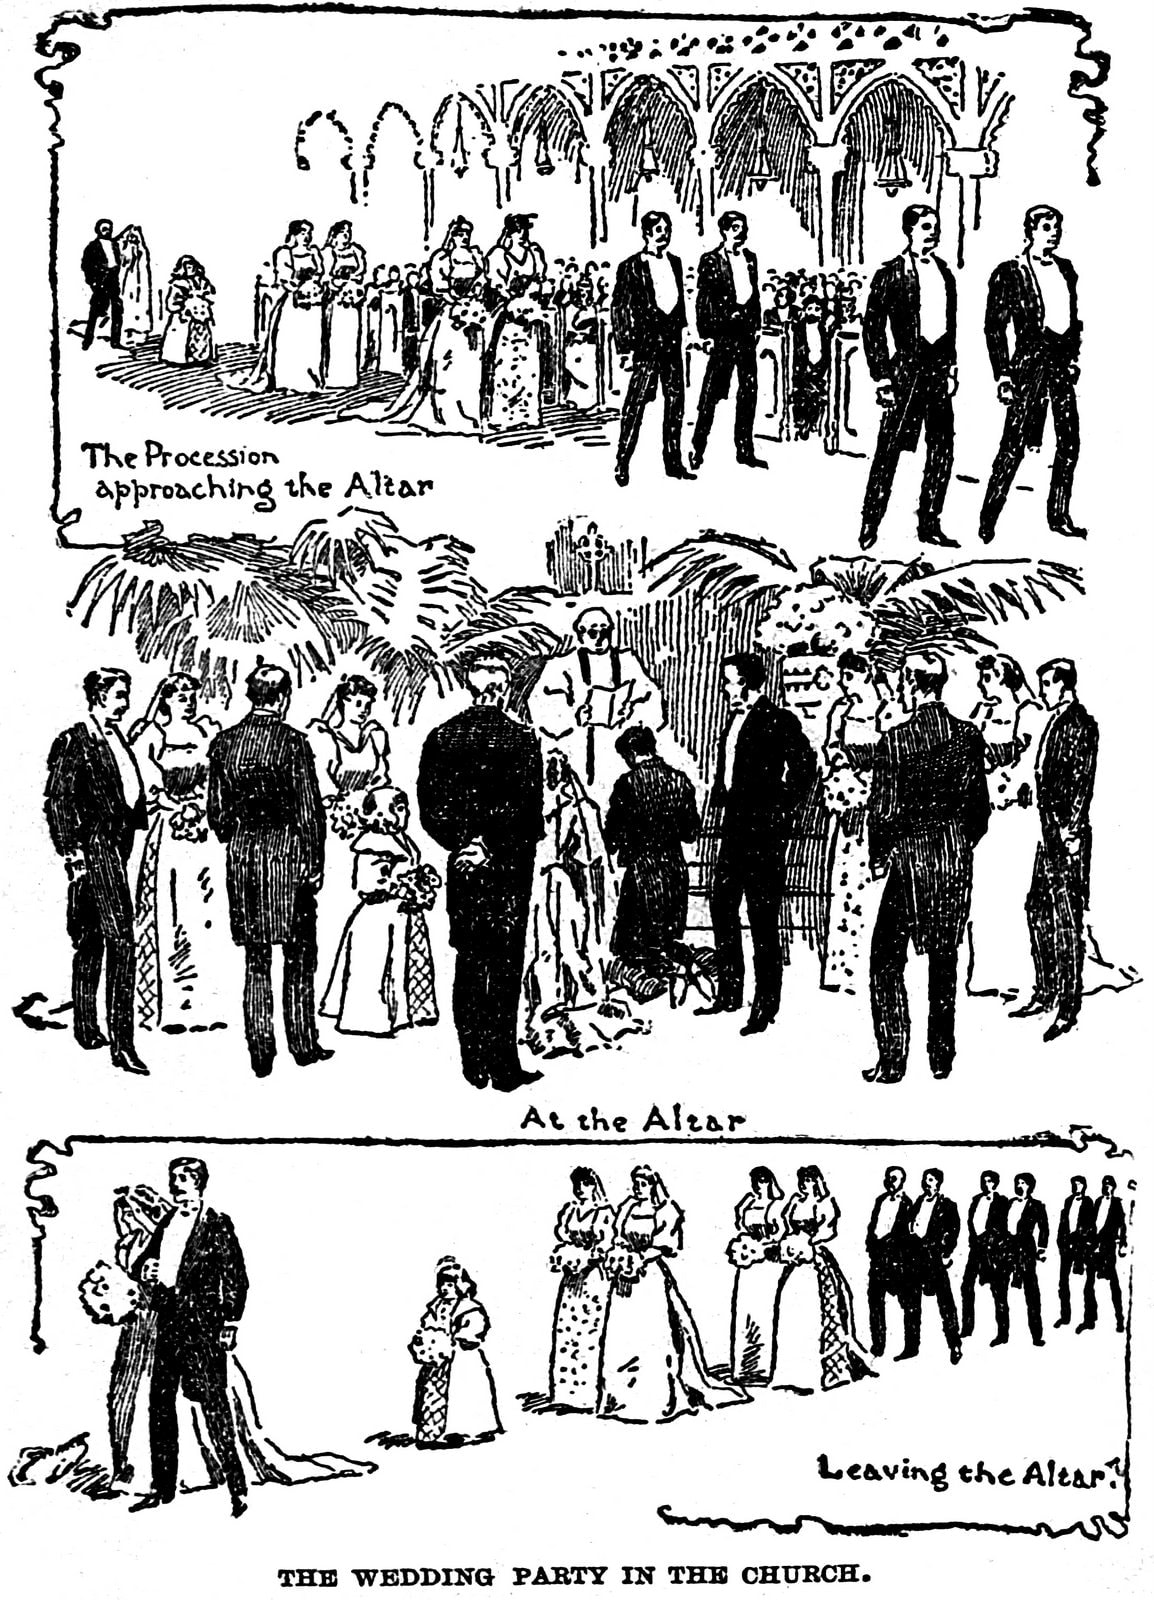 1893 Wedding procession etiquette tips